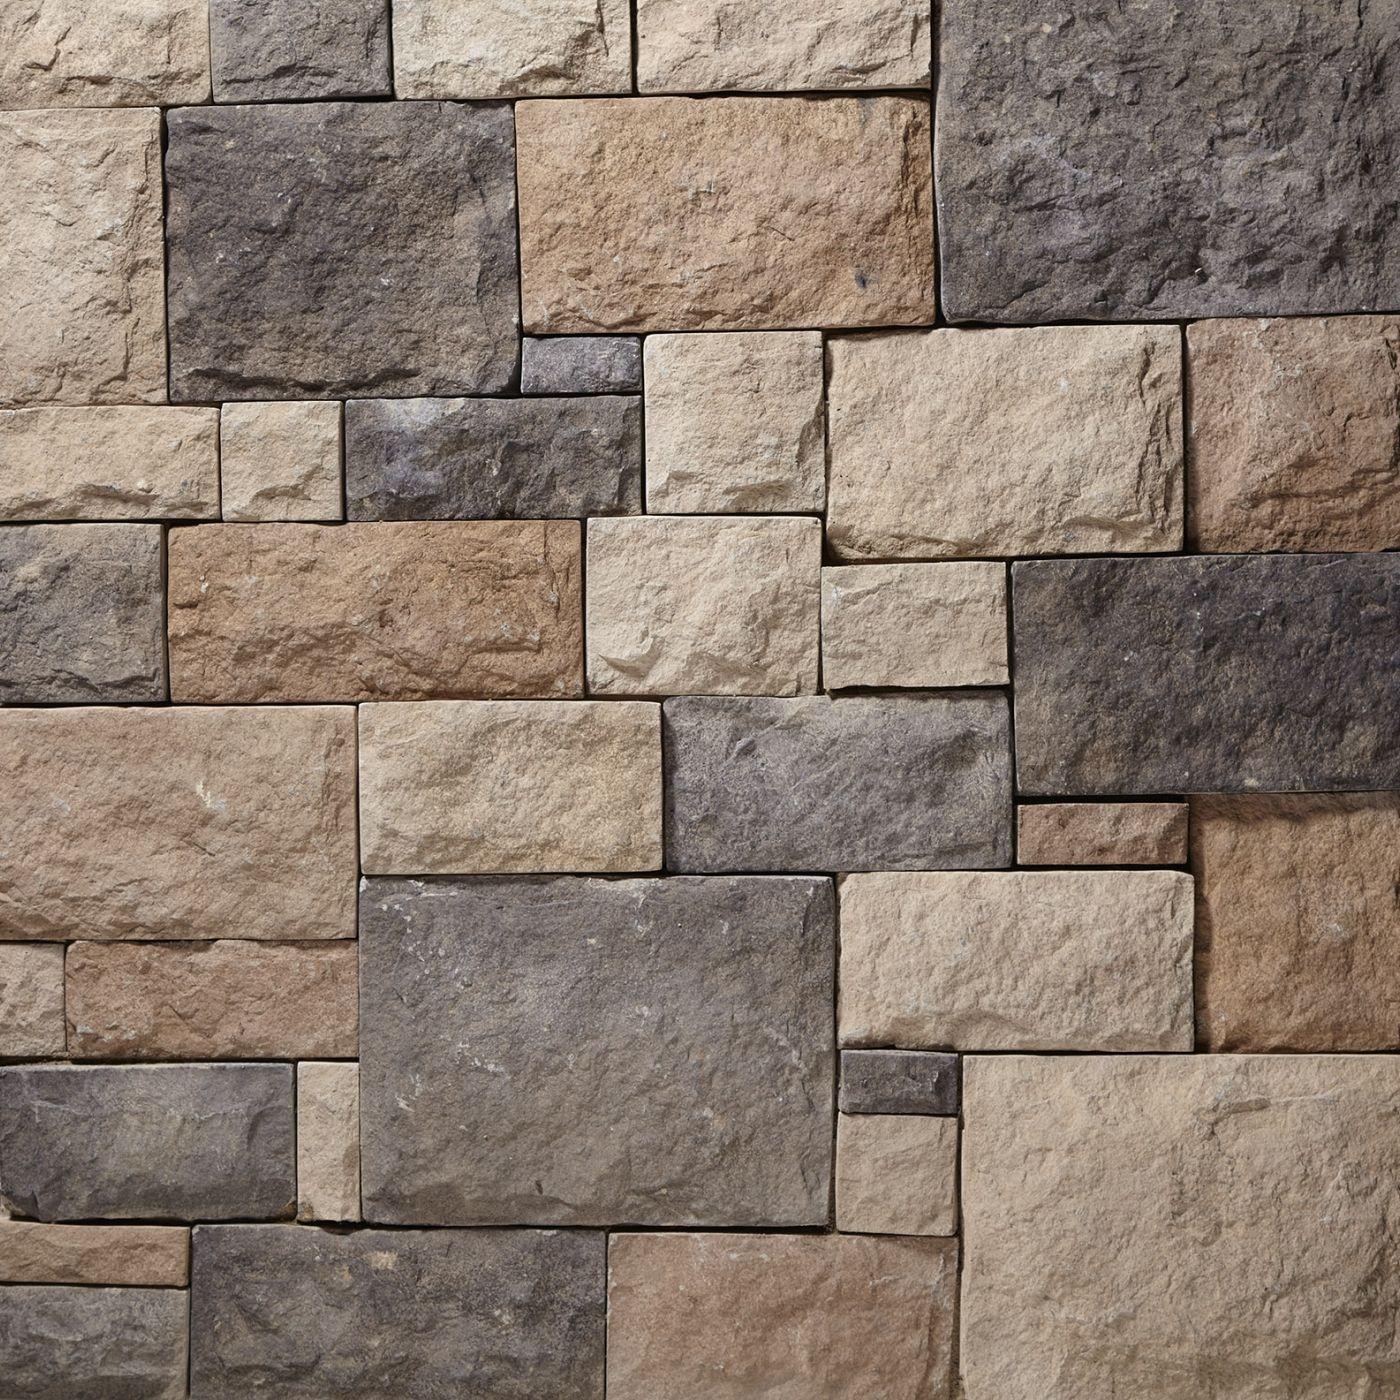 Mesa Verde European Castle Stone Veneer From Environmental Stoneworks Stone Cladding Texture Exterior Wall Tiles Wall Tiles Design